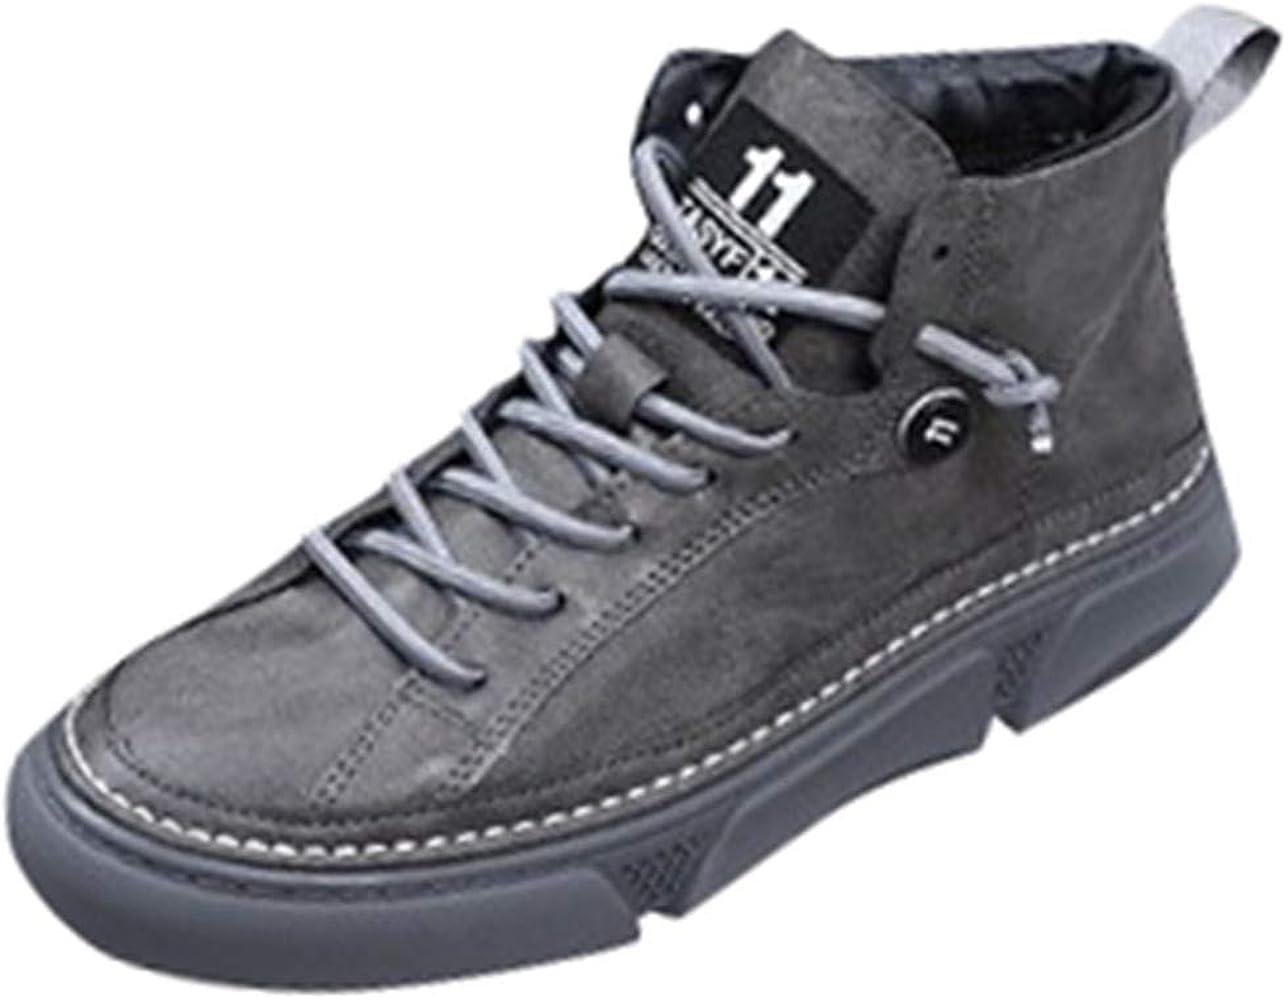 ALISIAM Zapatos Botas Retro de caña Alta para Hombre Zapatos